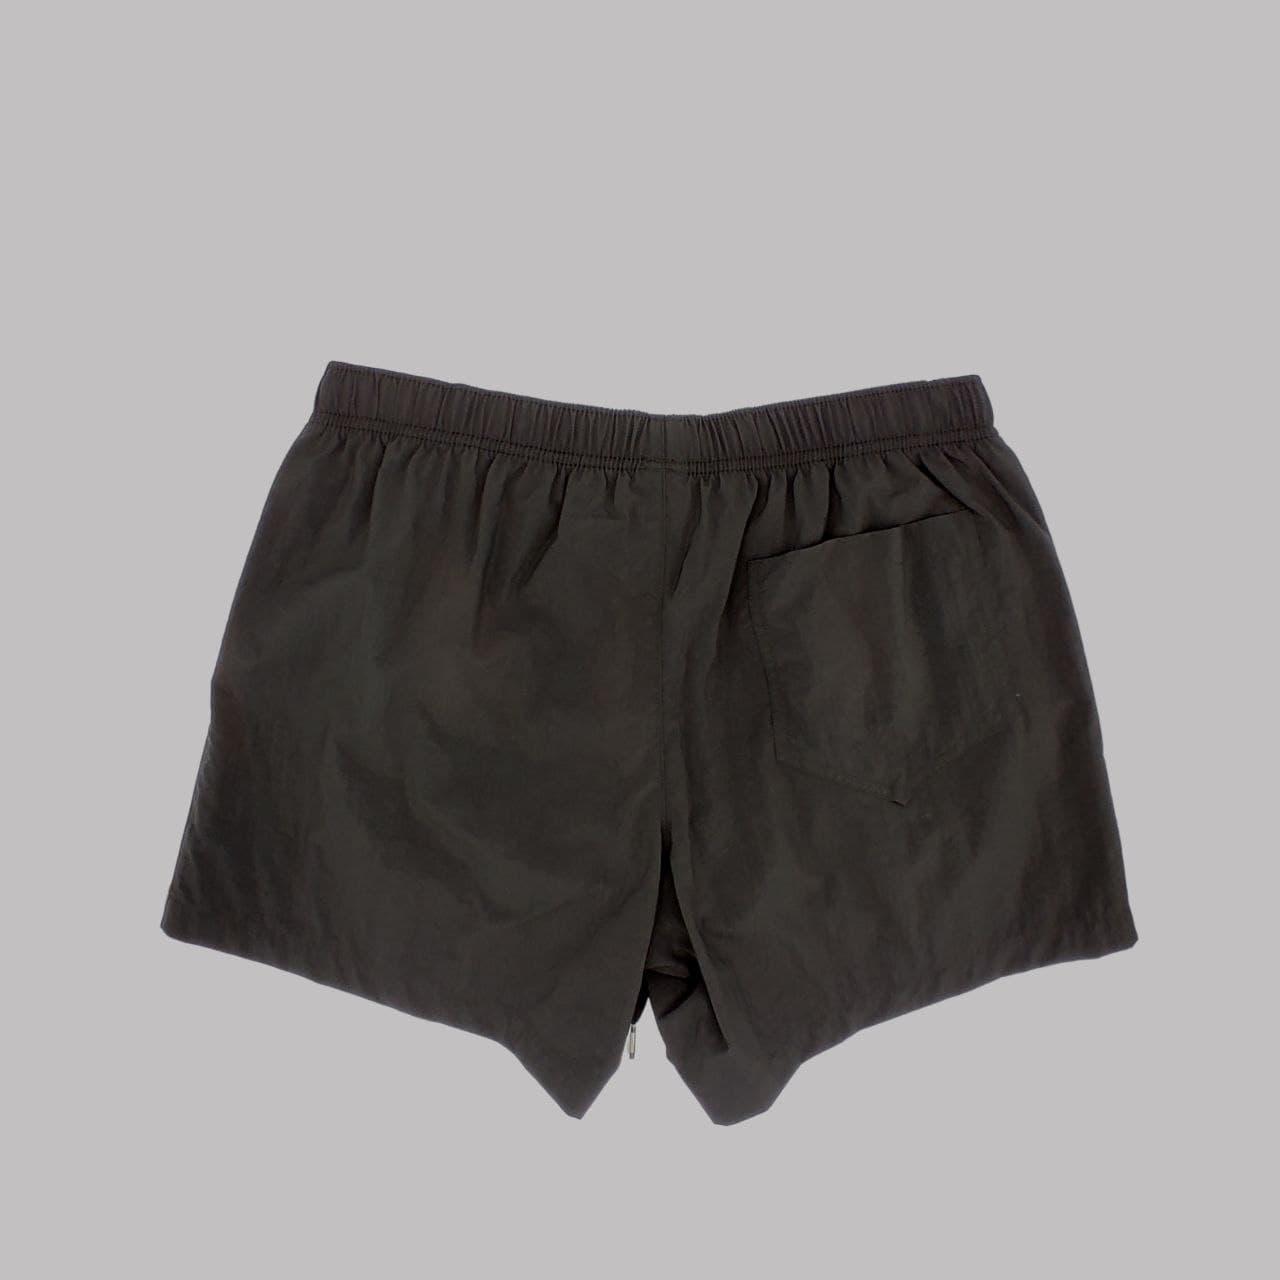 MOSCHINO SWIM | Swimwear | A6119 54390555